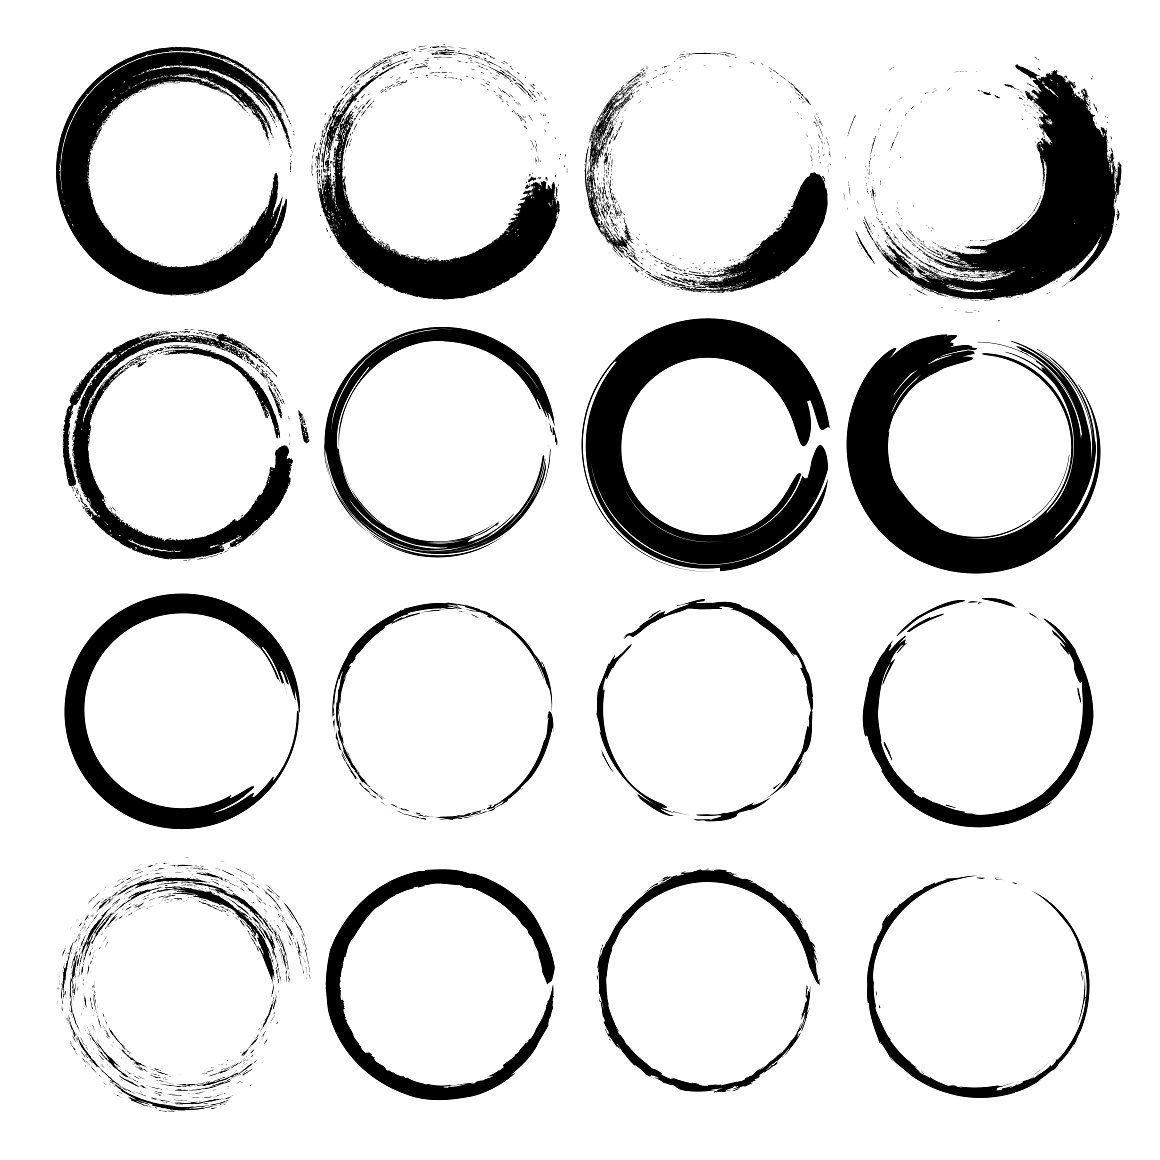 Grunge circle grunge circle vector circles round isolated